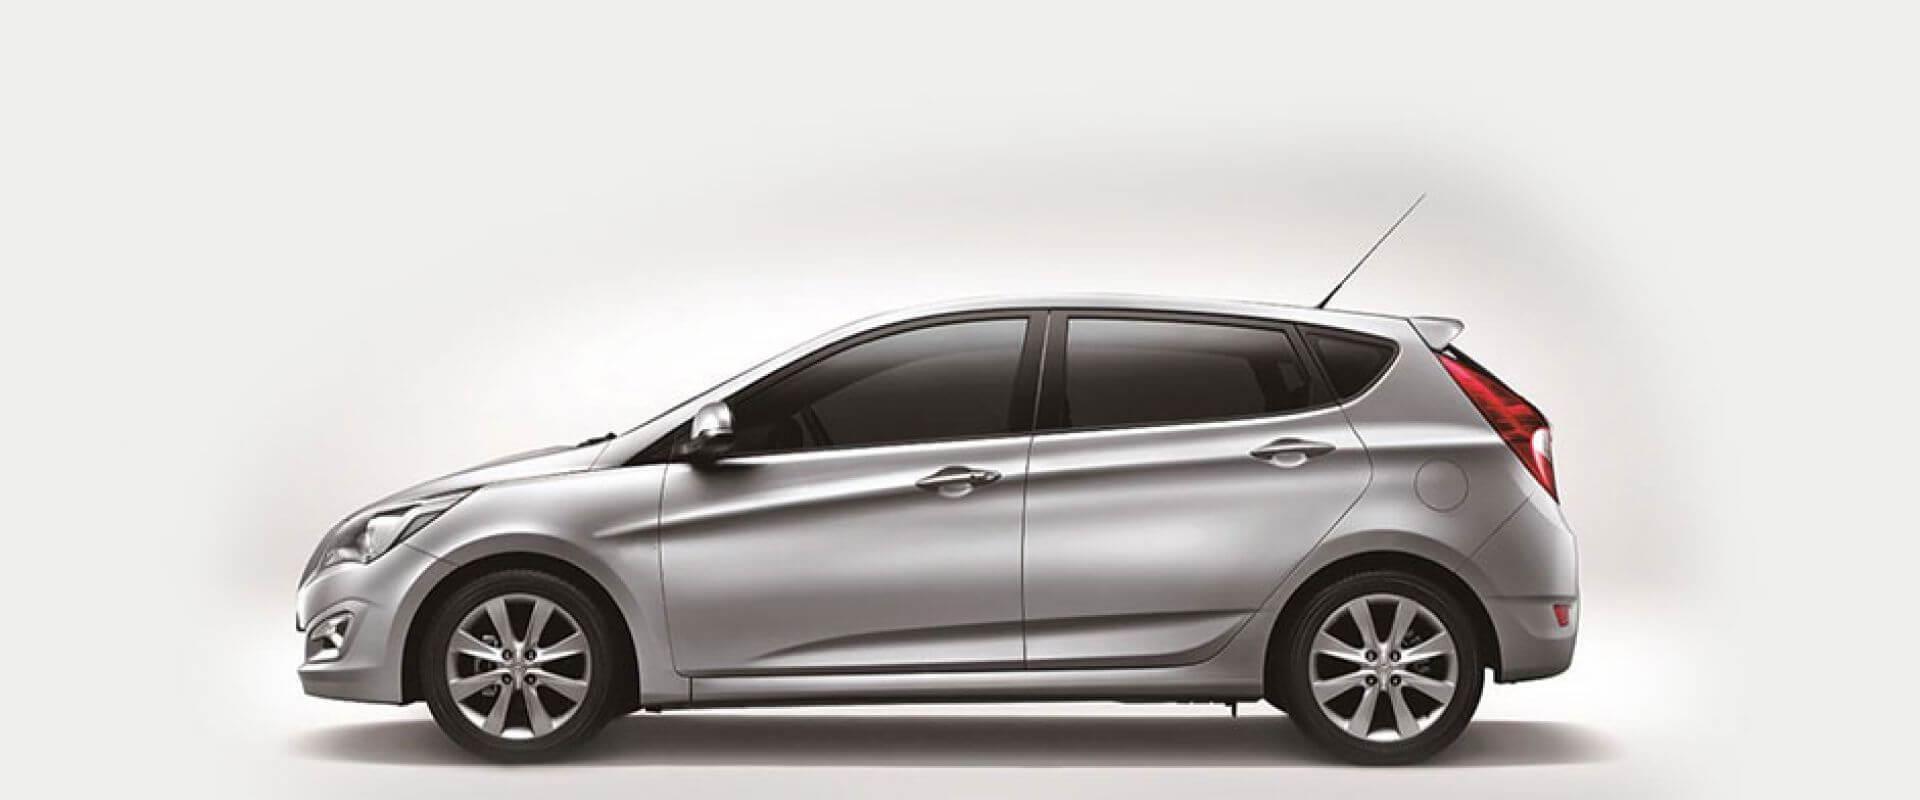 Купить б/у Hyundai Solaris с пробегом: продажа - Auto ru